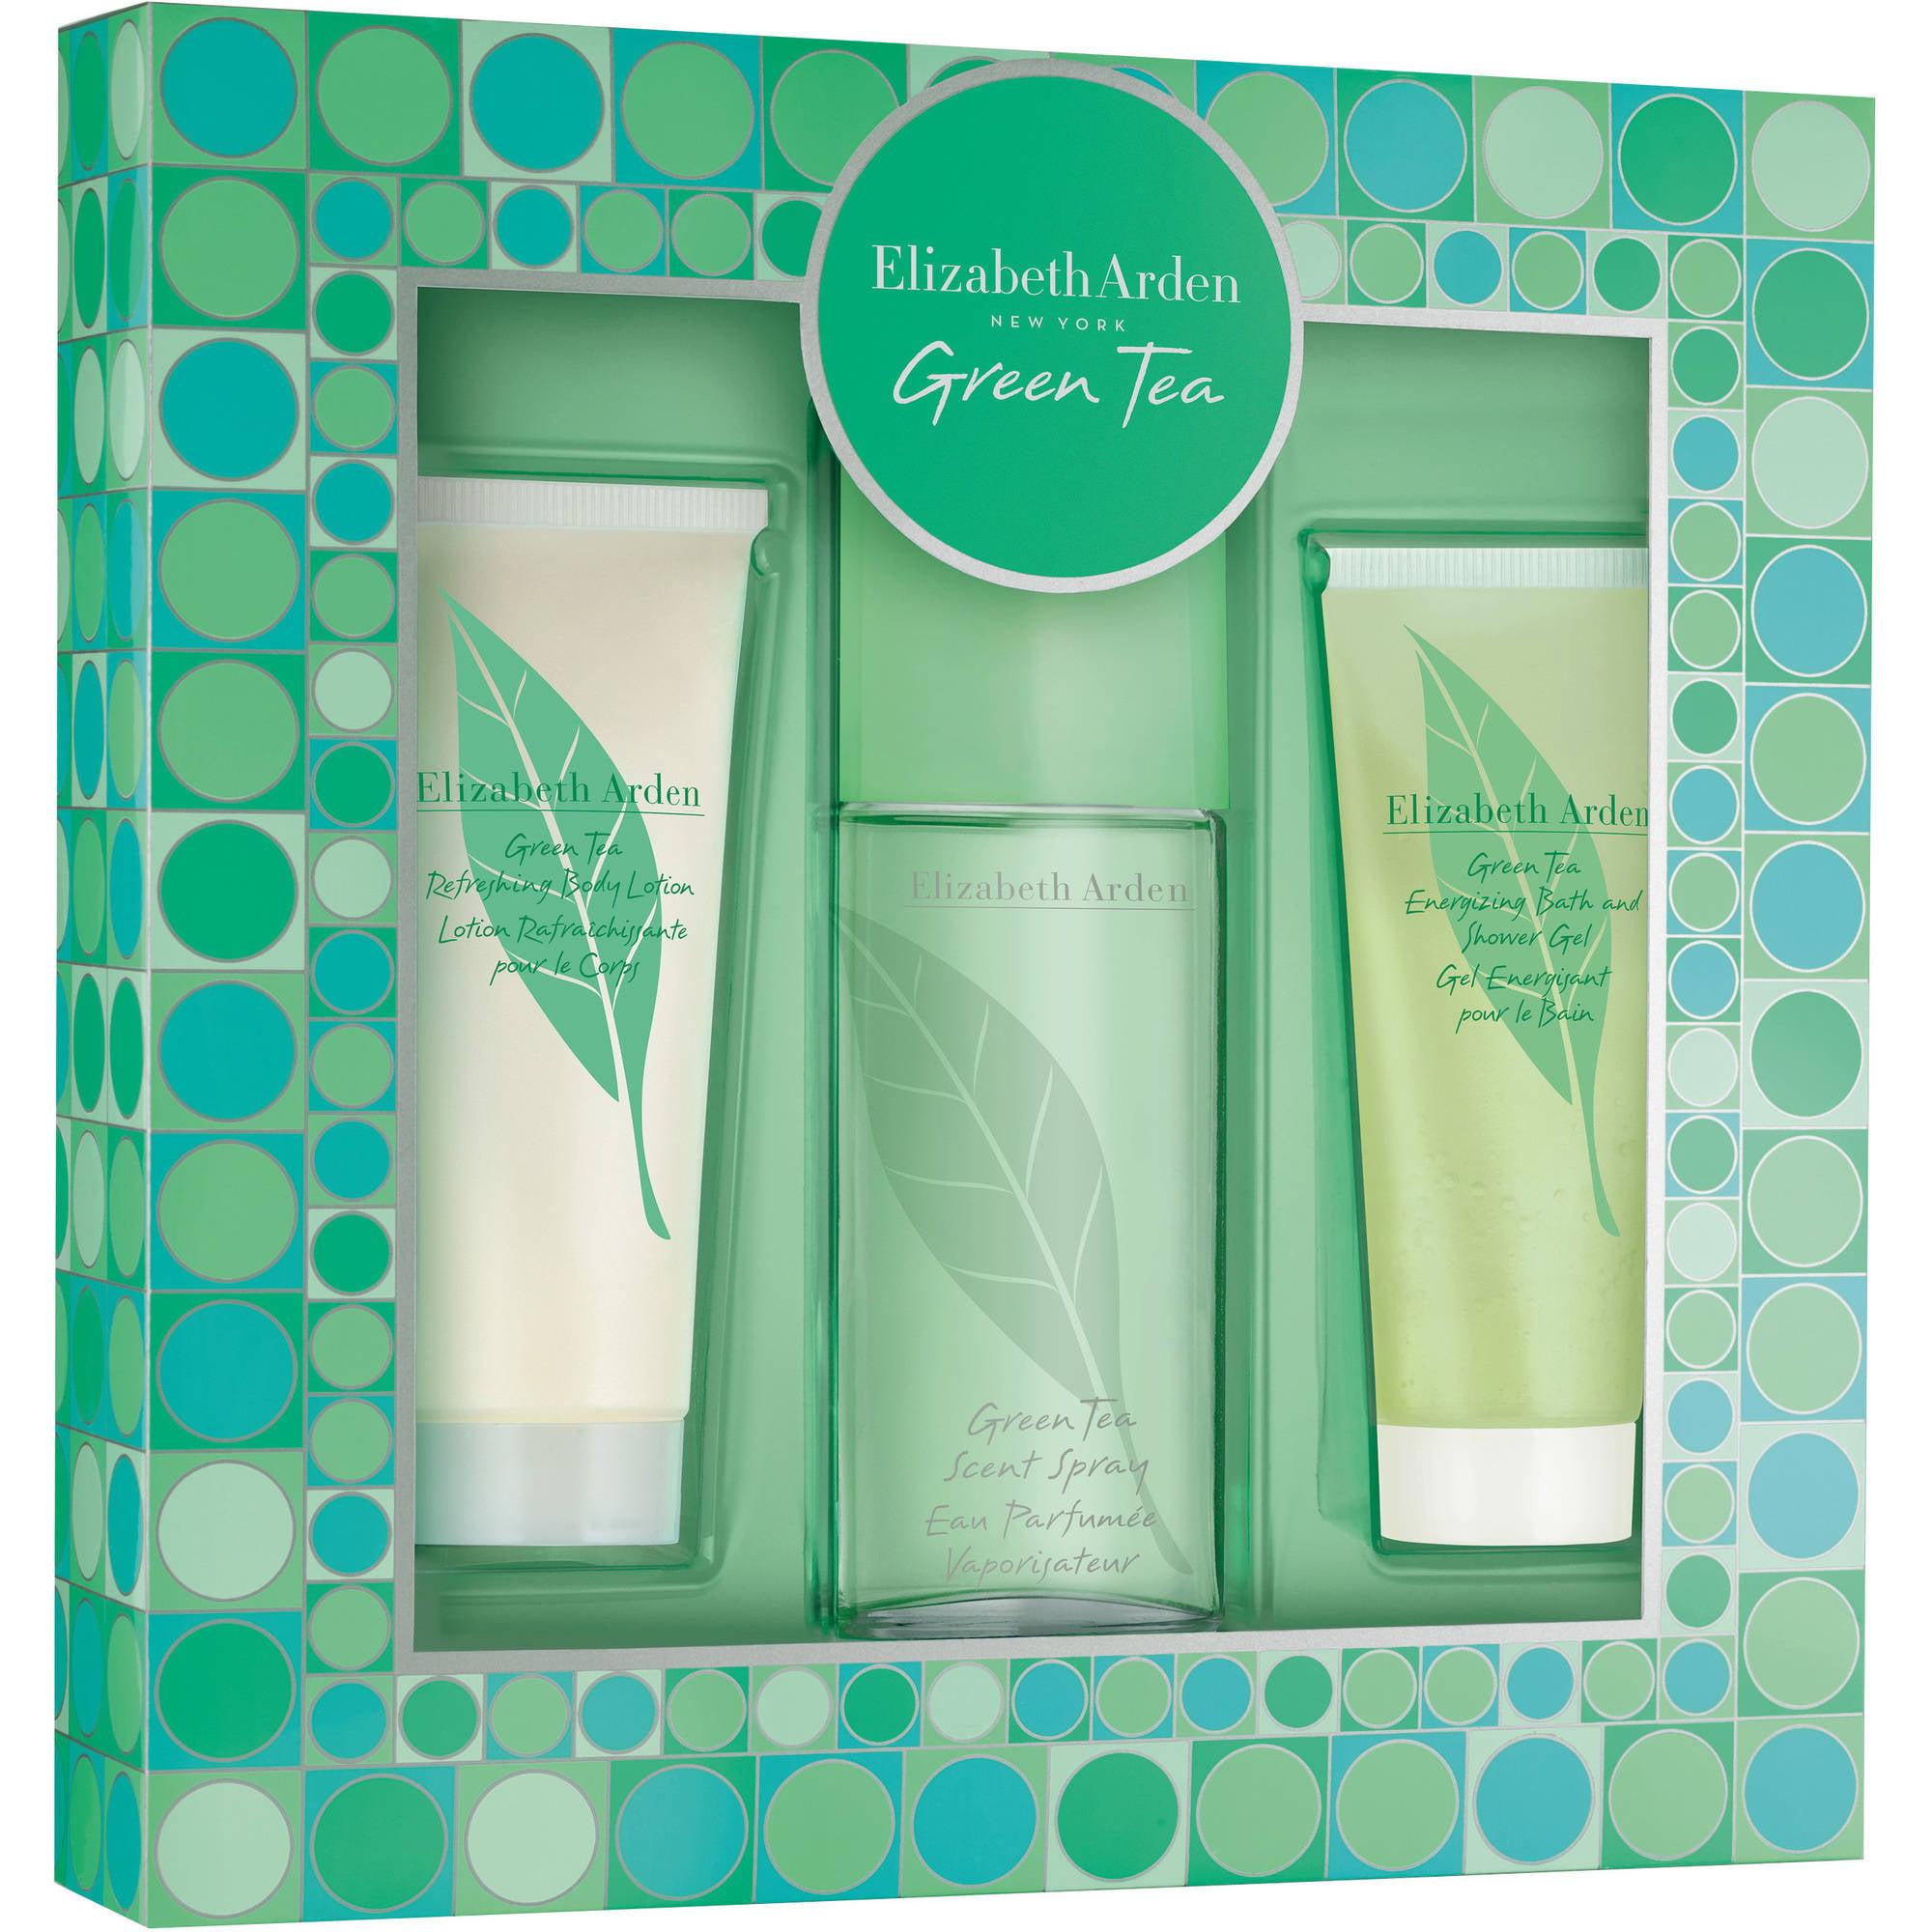 Elizabeth Arden Green Tea Fragrance Gift Set for Women, 3 pc